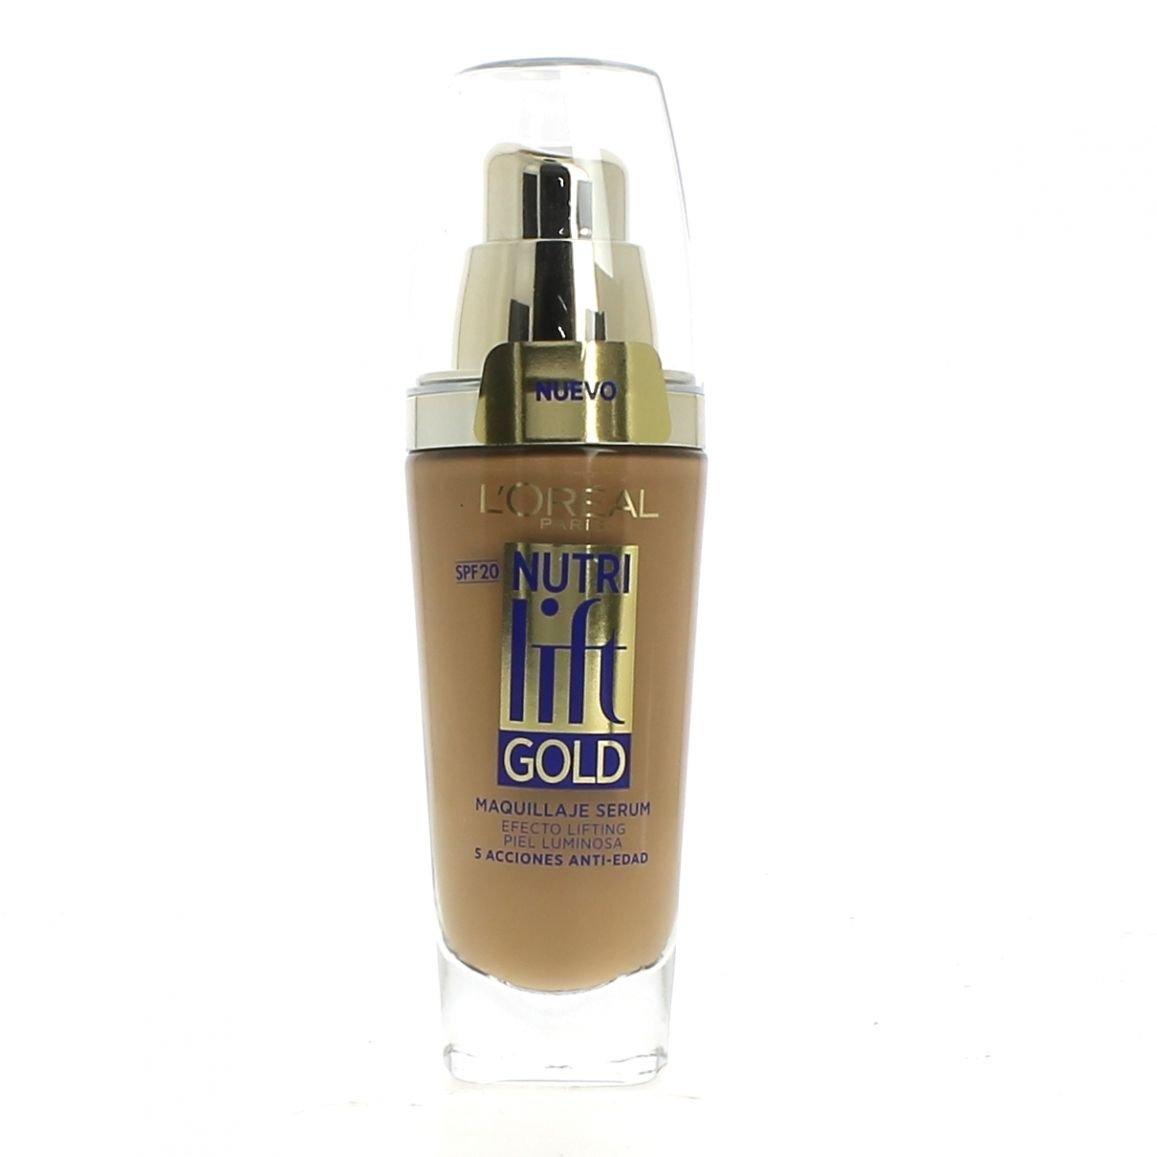 L'Oreal Nutrilift Gold: base de maquillaje fluida, 370 ml, colorcapuchino L' Oreal